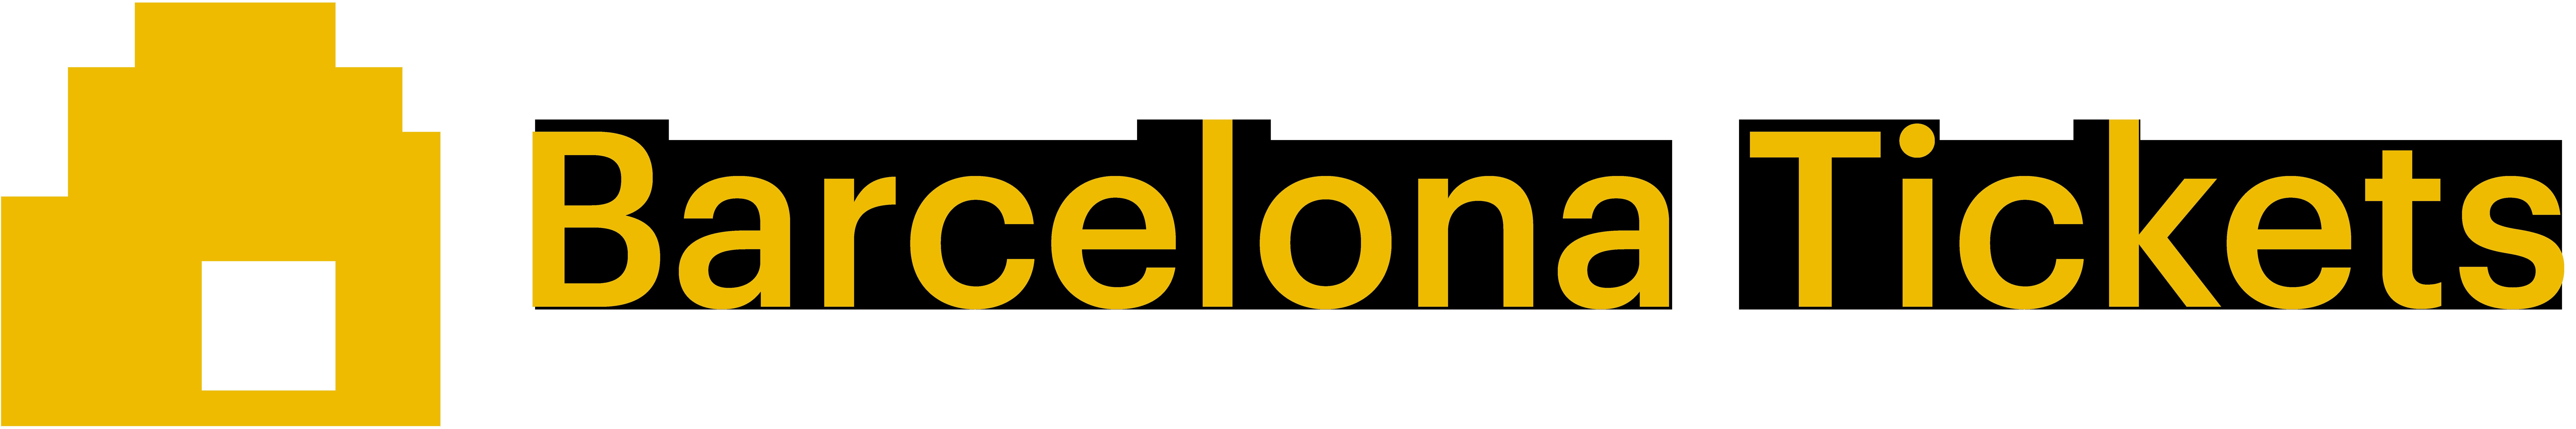 Sagrada Familia Logo